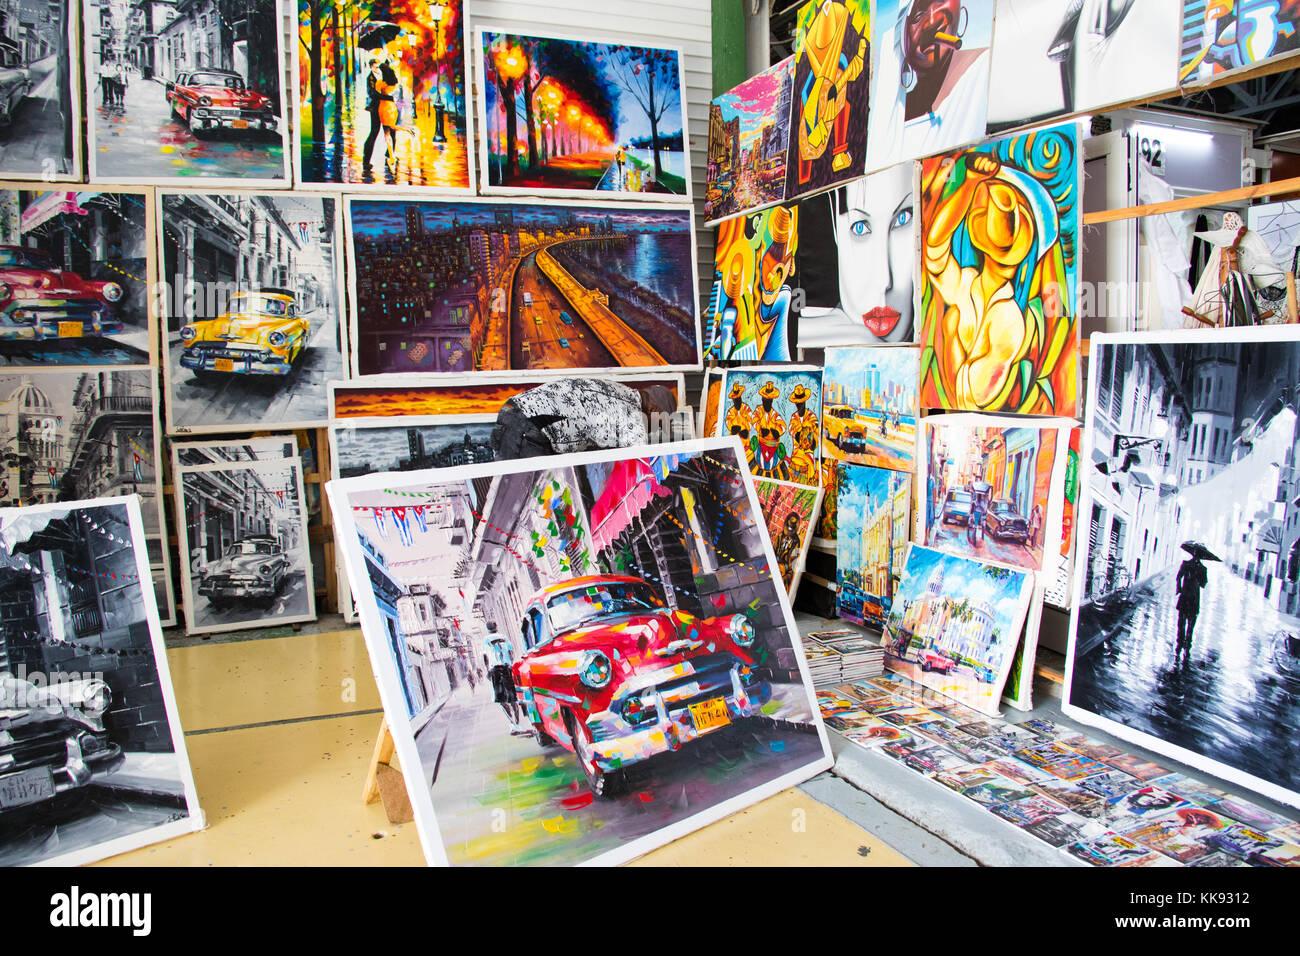 Centro Cultural Antiguos Almacenes De Deposito San Jose market, Havana, Cuba - Stock Image